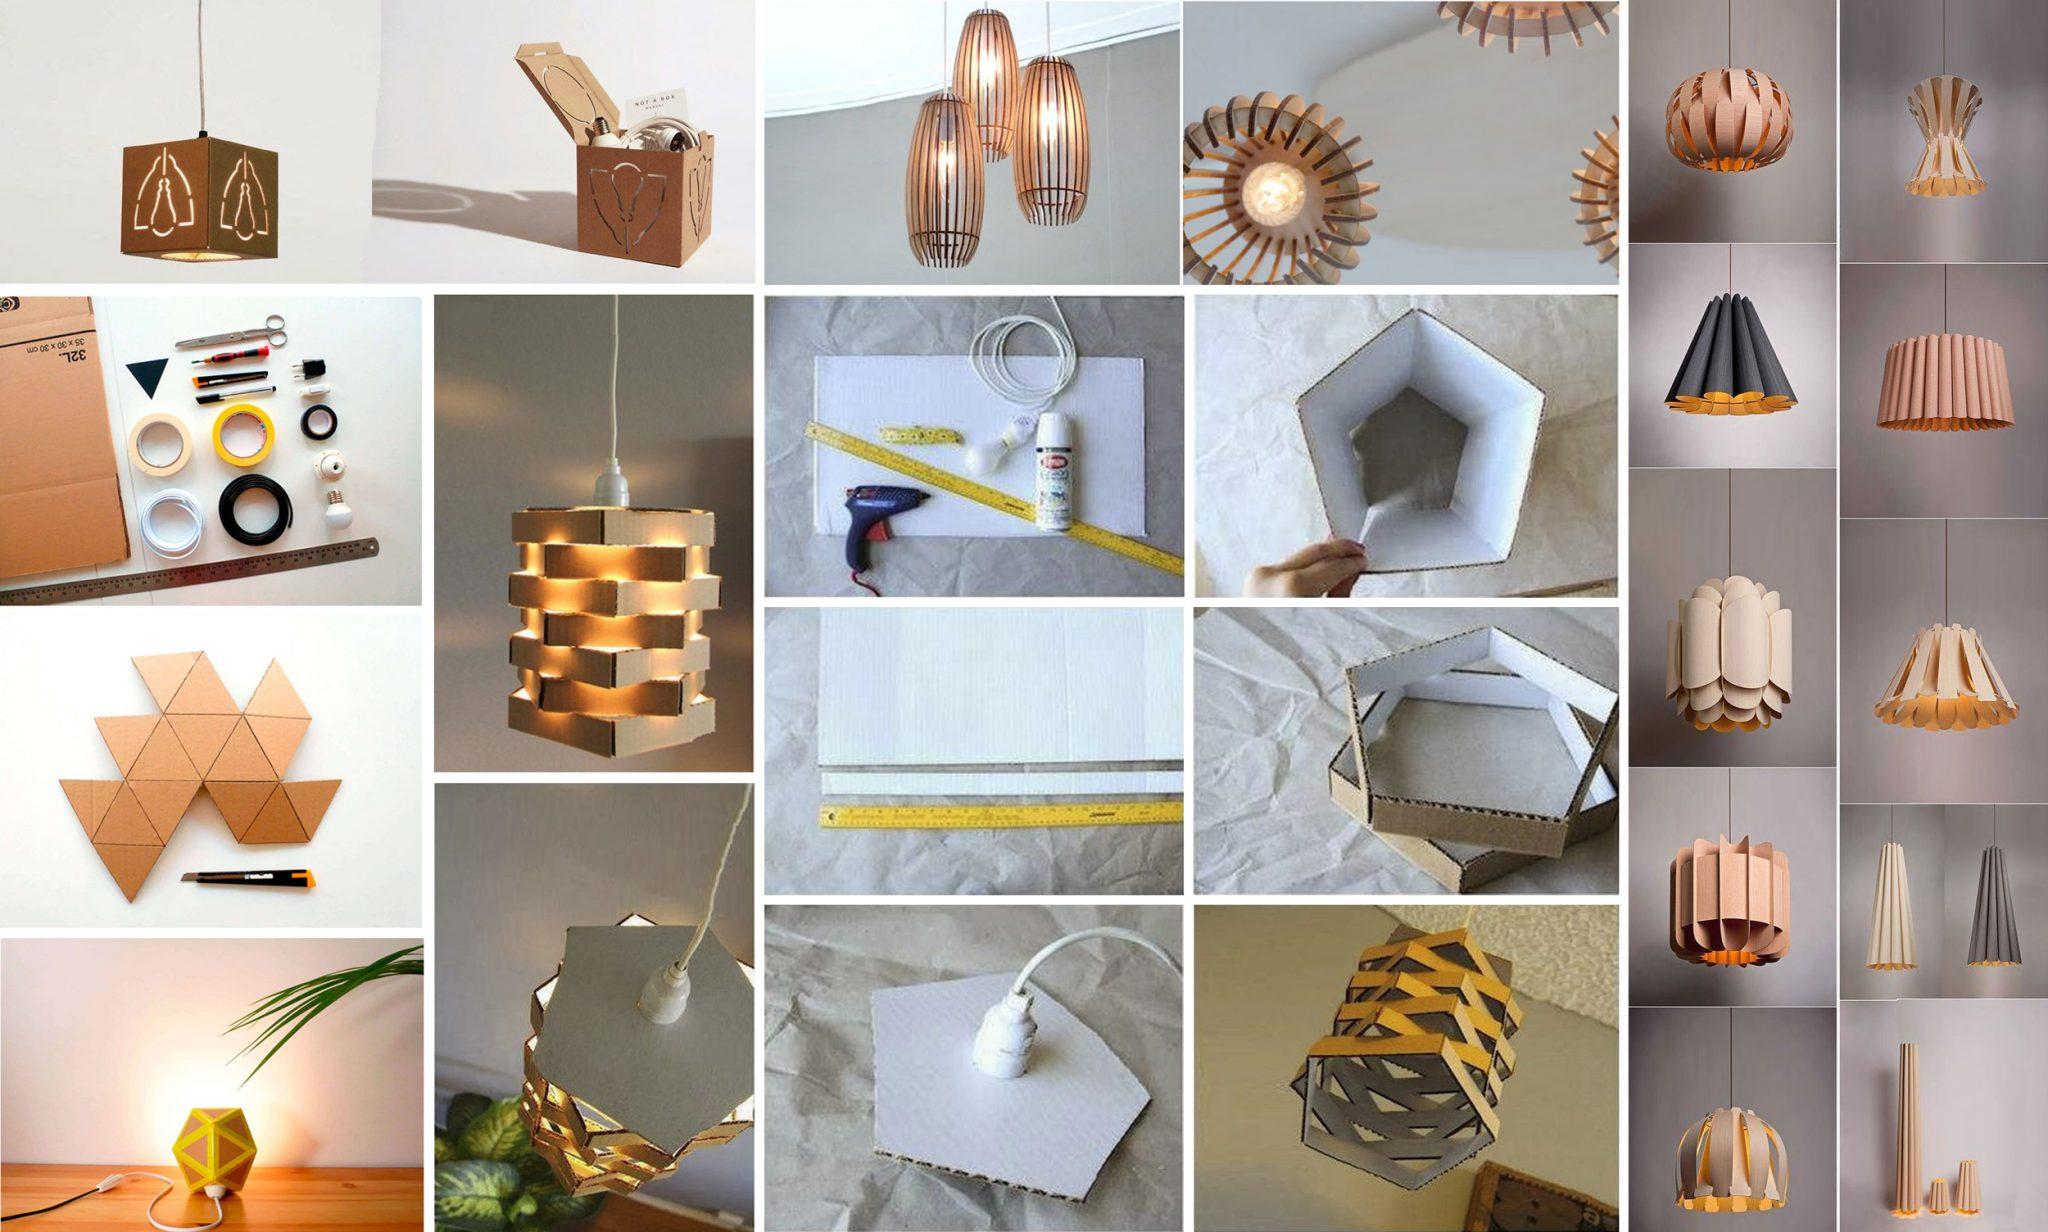 Lámparas con cajas de cartón